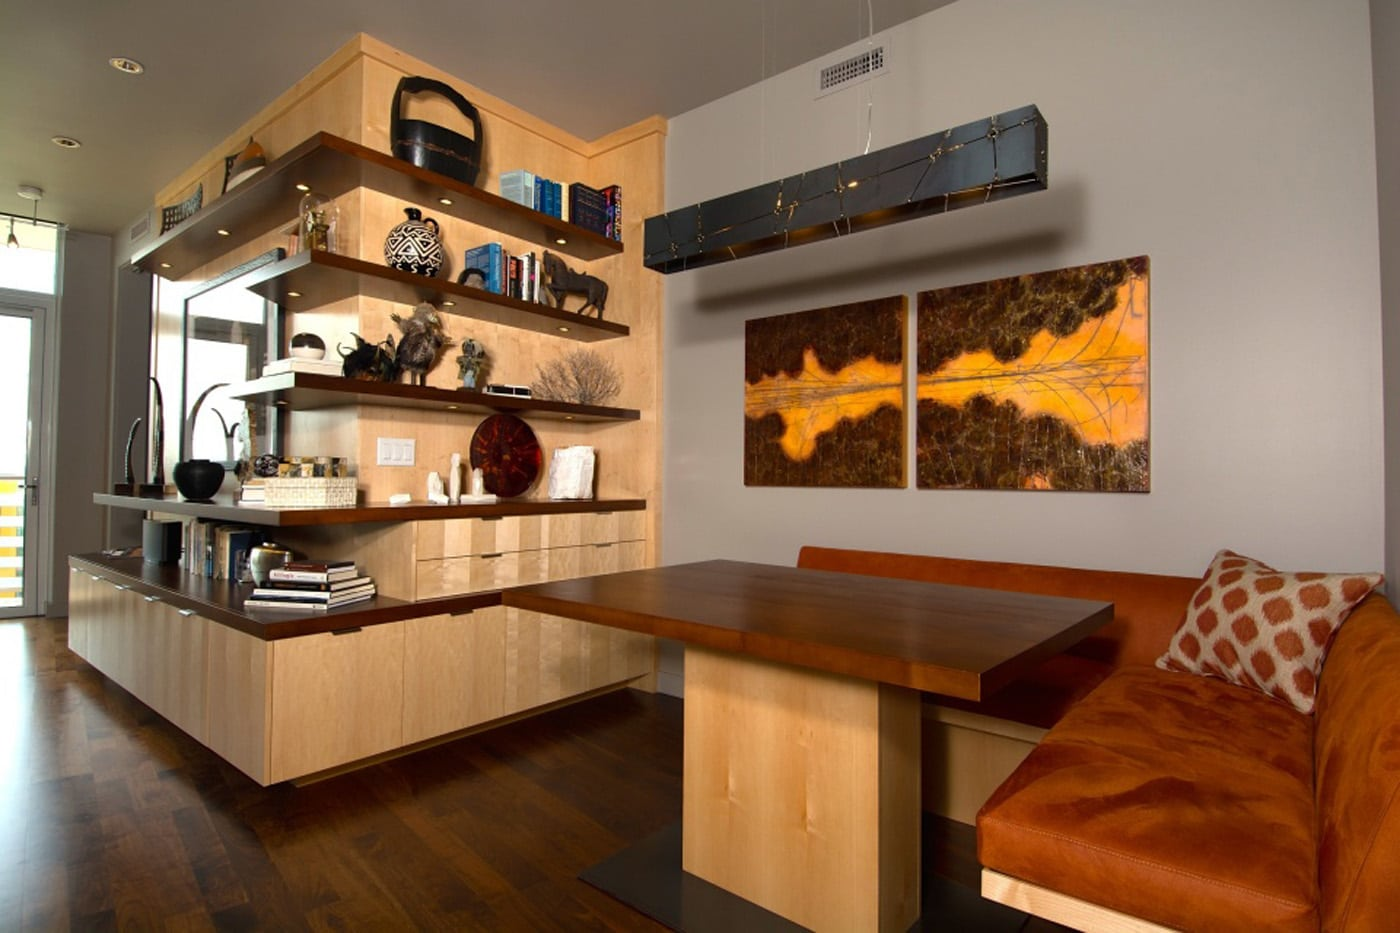 home designers portland oregon home and landscaping design awbrey butte remodel traditional living room